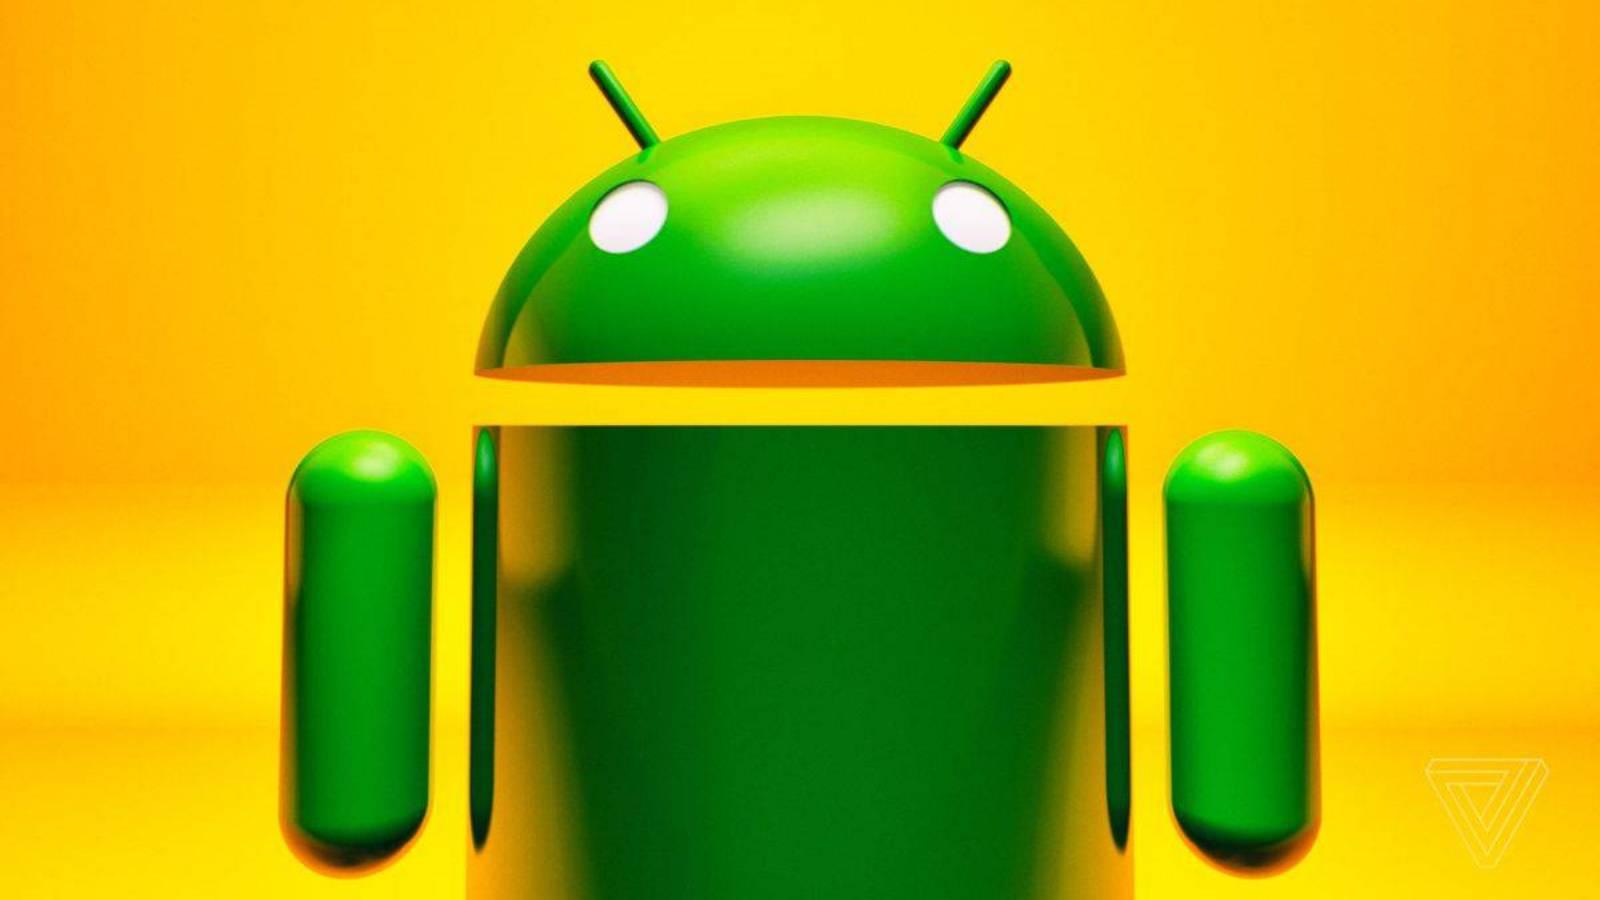 Android Anunt ULUITOR Sistemul Operare